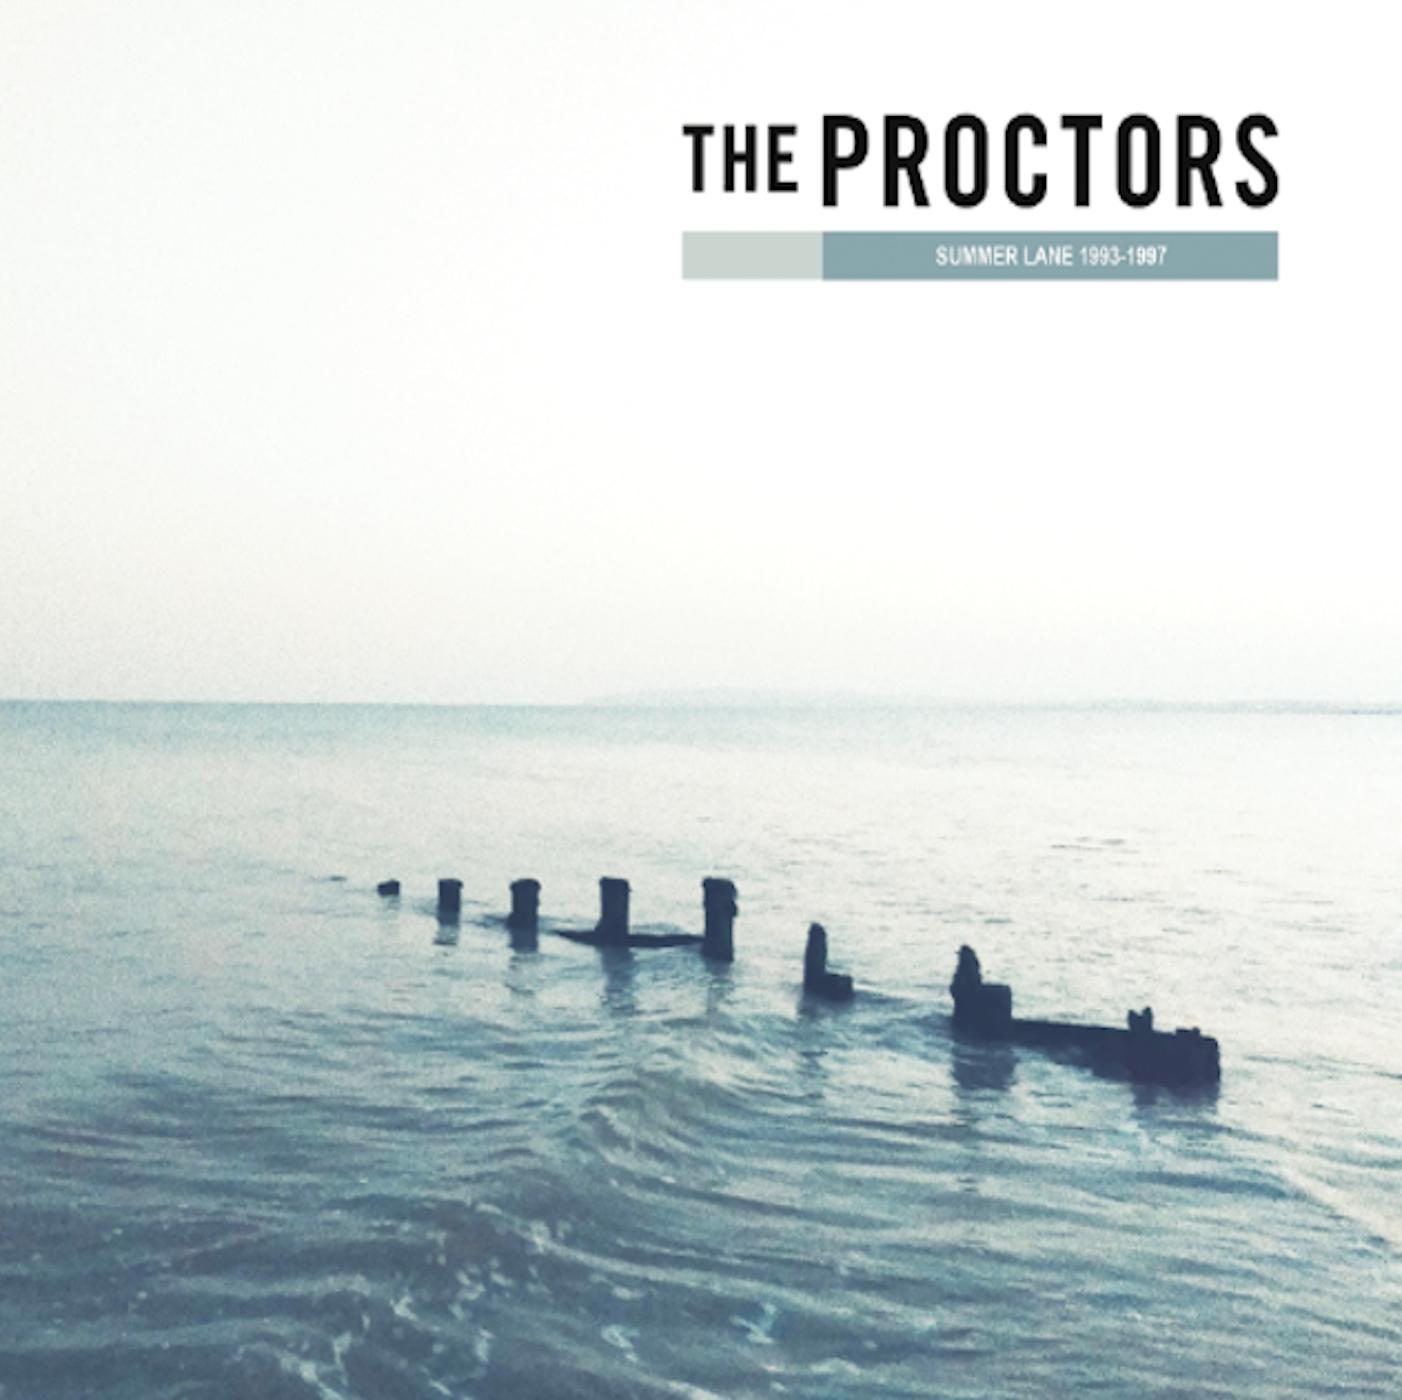 The Proctors - Summer Lane CD